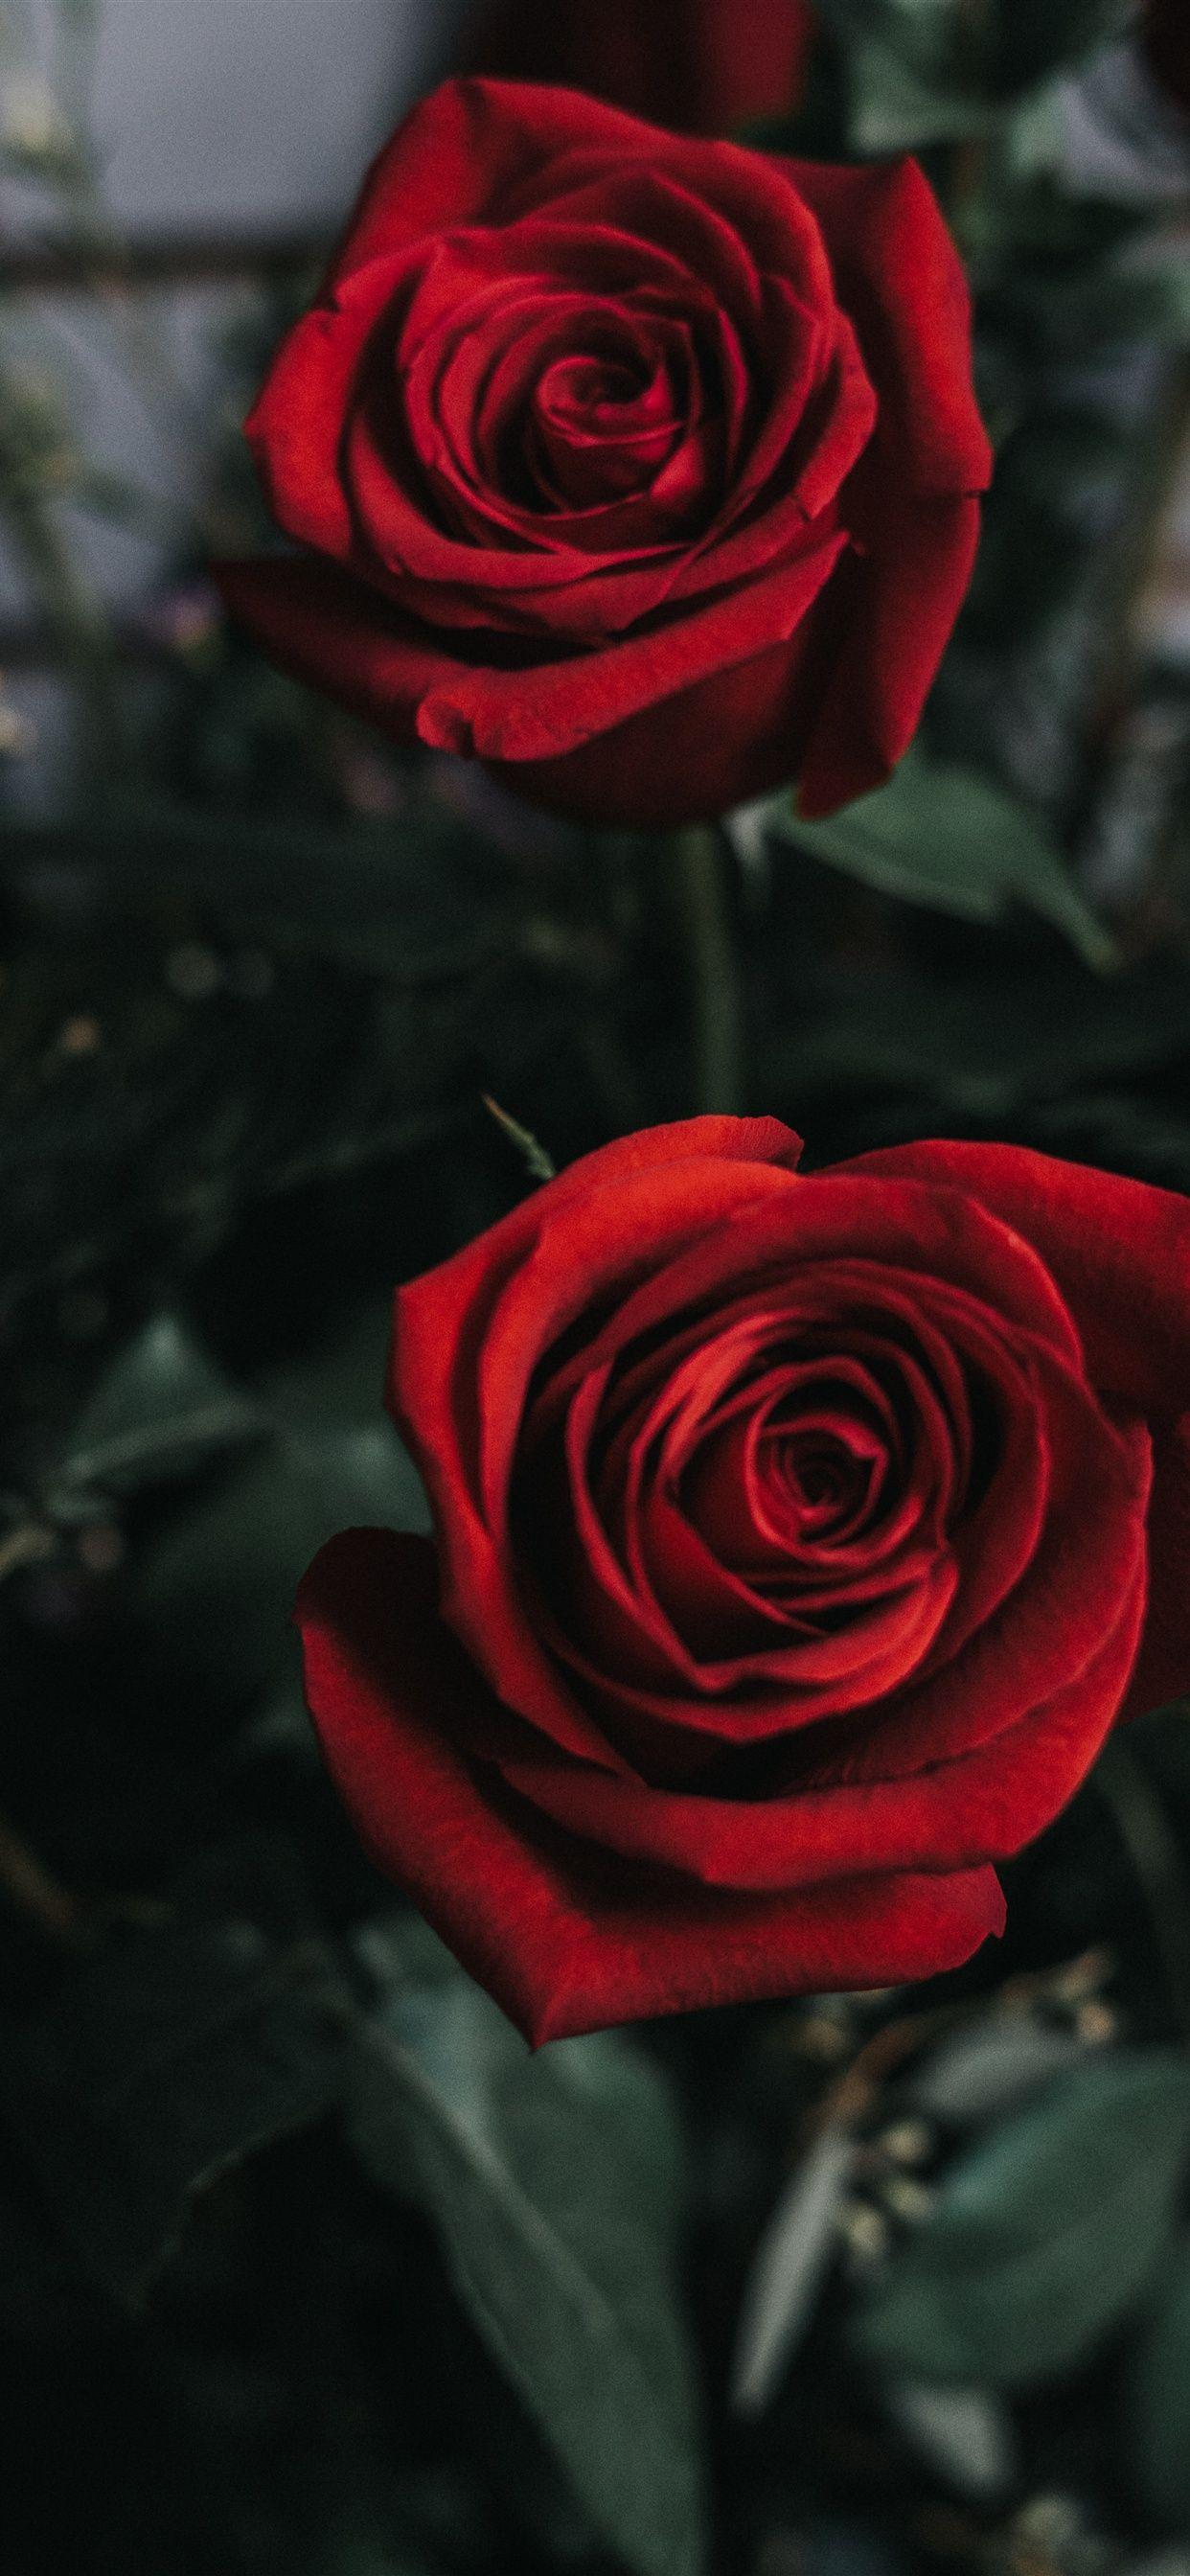 Wallpaper Iphone Xs Max 328 Rose Flower Wallpaper Red Roses Wallpaper Love Rose Flower